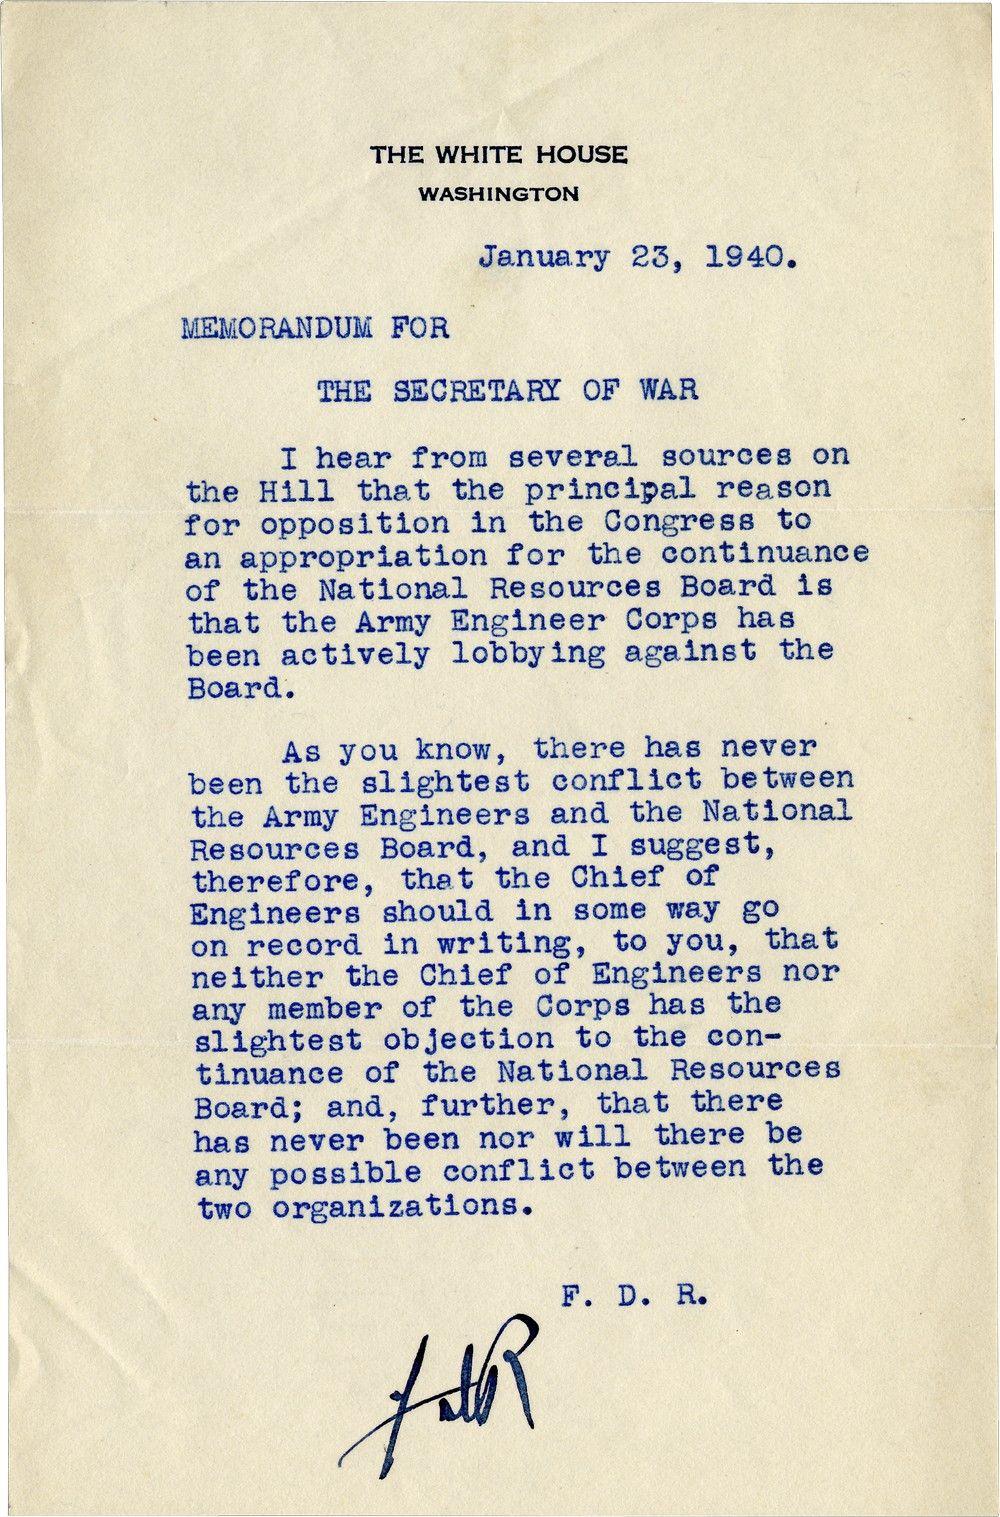 President Franklin D. Roosevelt Adjudicates an Intergovernmental Turf War